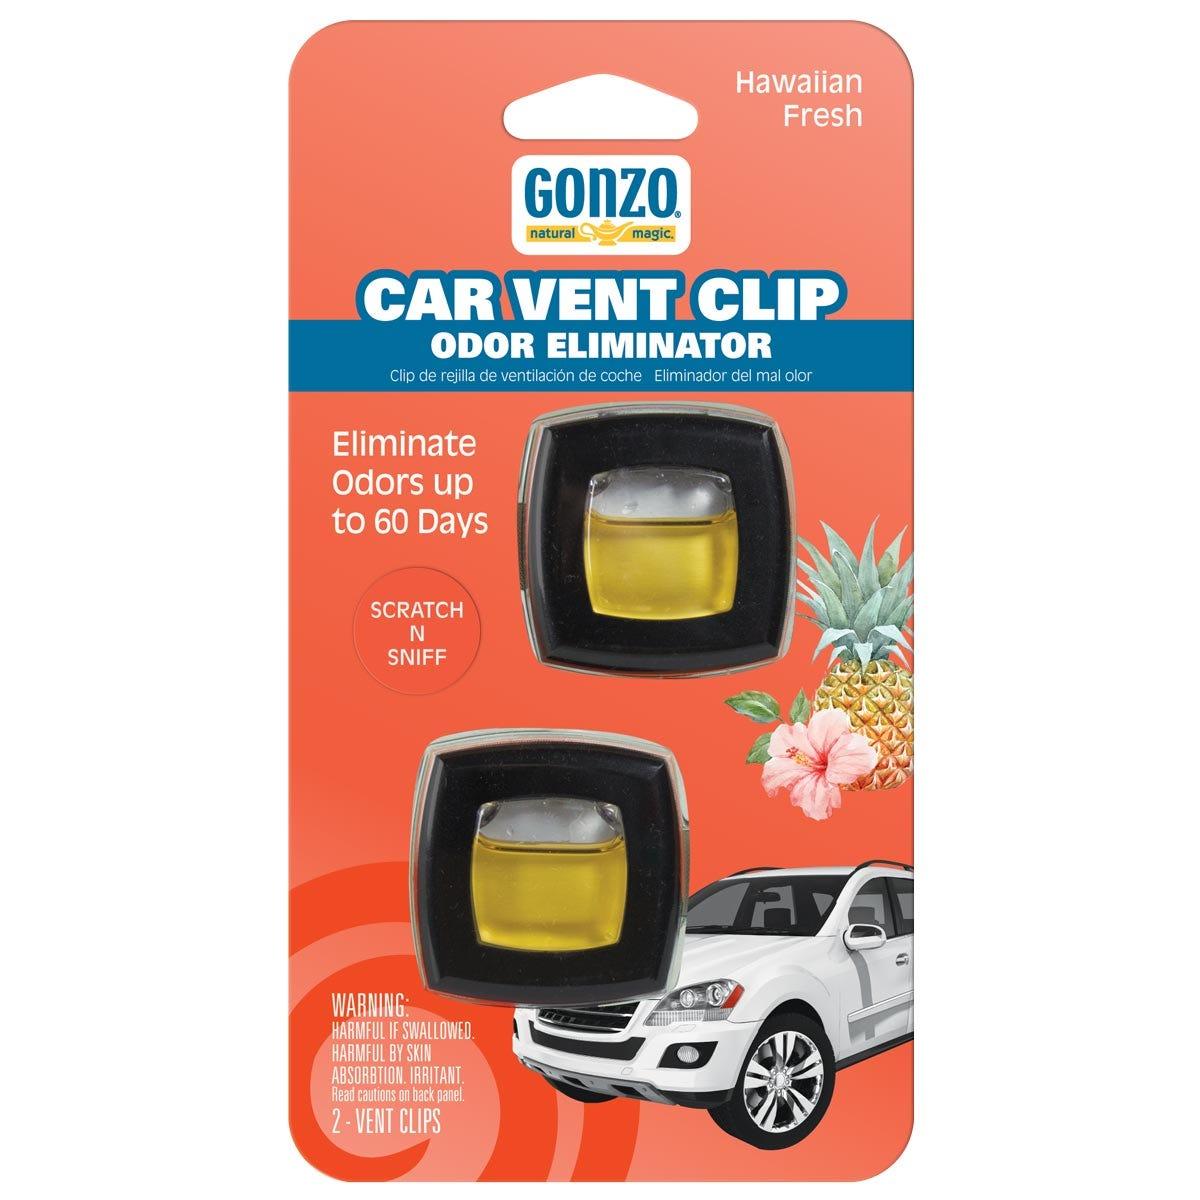 Car Vent Clip Odor Eliminator